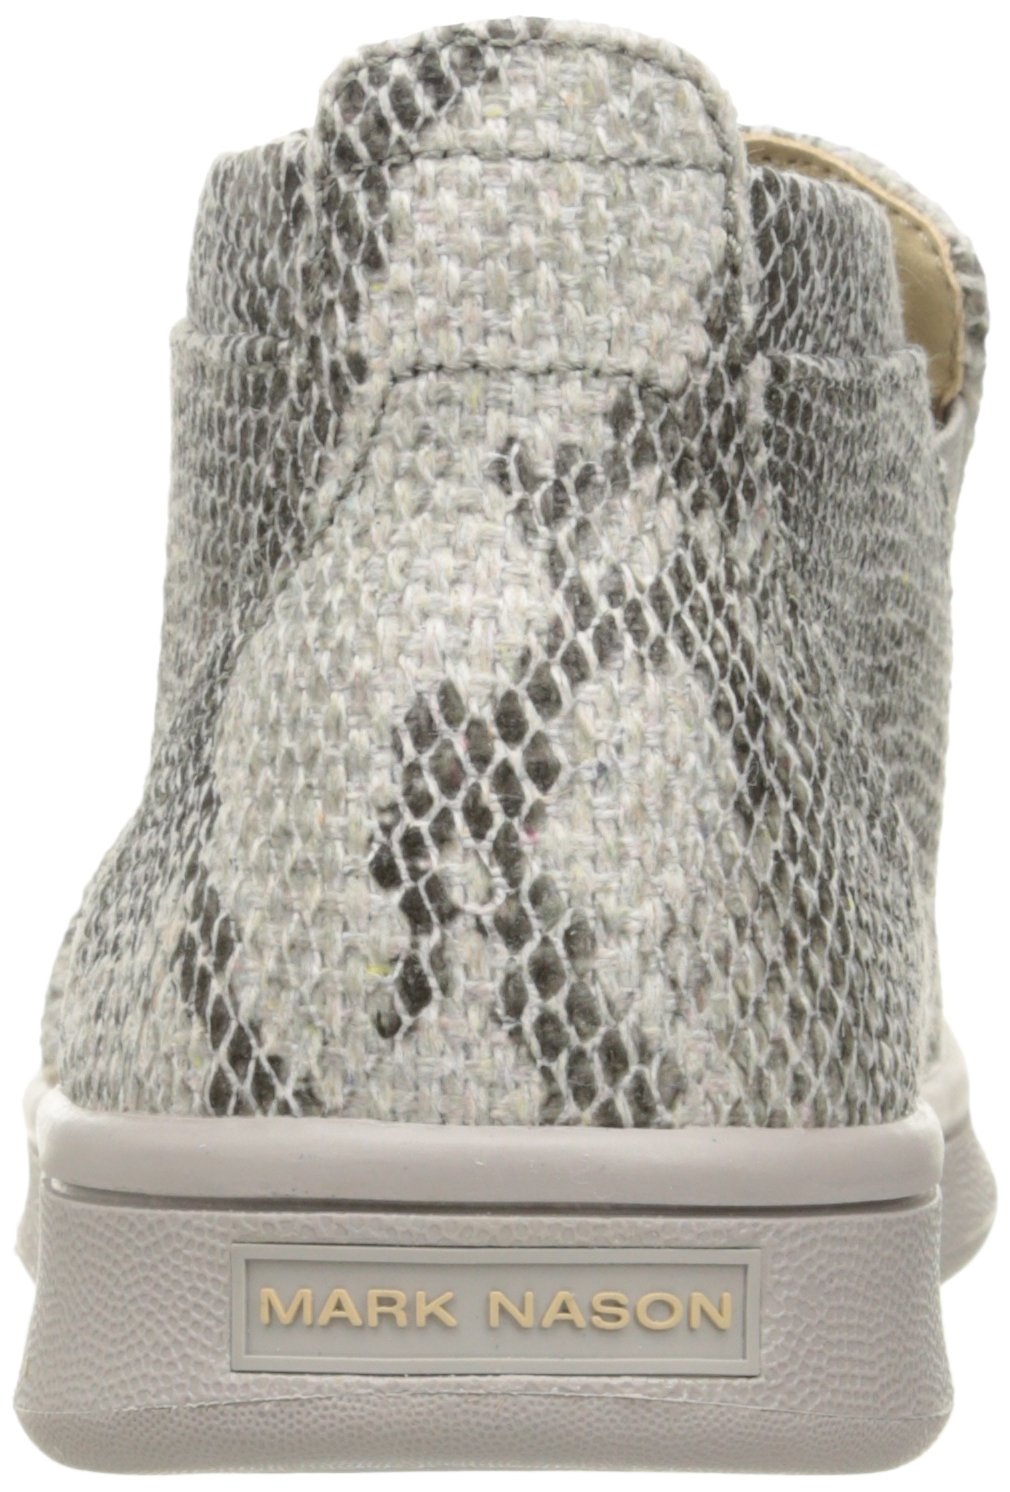 Mark Nason Los Angeles B06XGTFMKH Women's Uptown Fashion Sneaker B06XGTFMKH Angeles 6 B(M) US|Snake e6dfdc